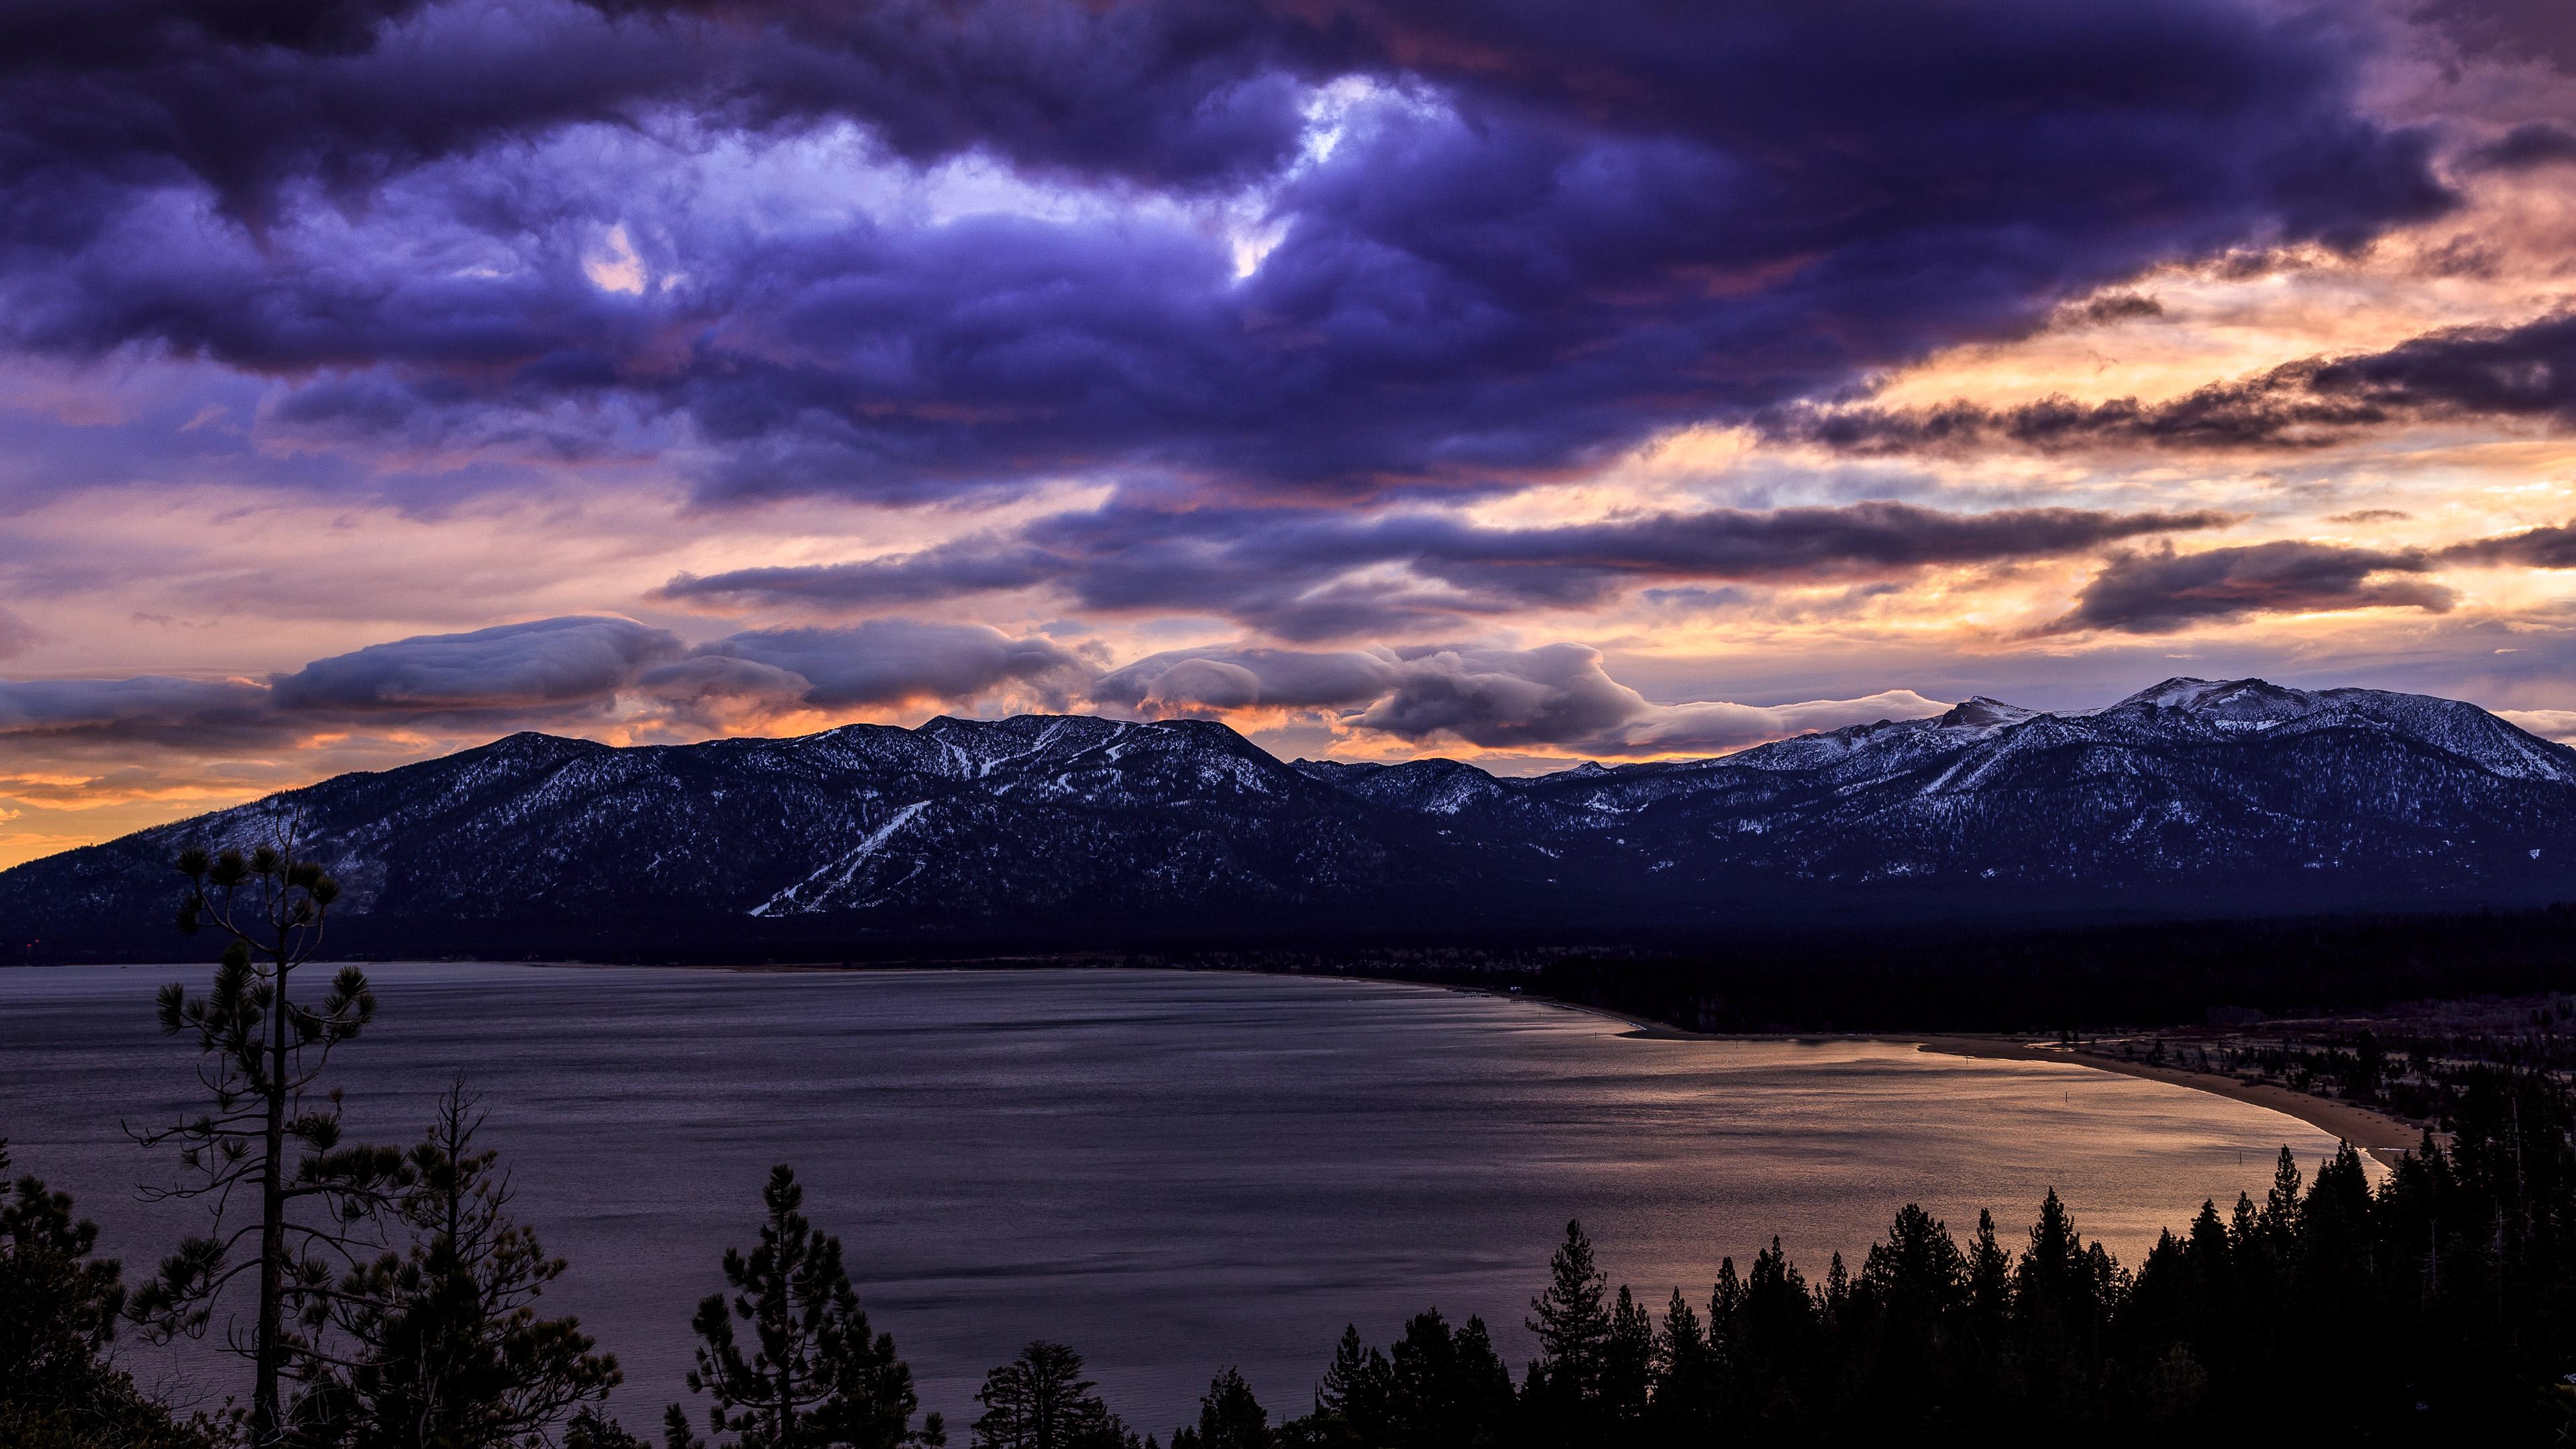 2048x2048 Lake Ultra Hd 4k Ipad Air Hd 4k Wallpapers: South Lake Tahoe 4k Sunrise Wallpapers, Sky Wallpapers